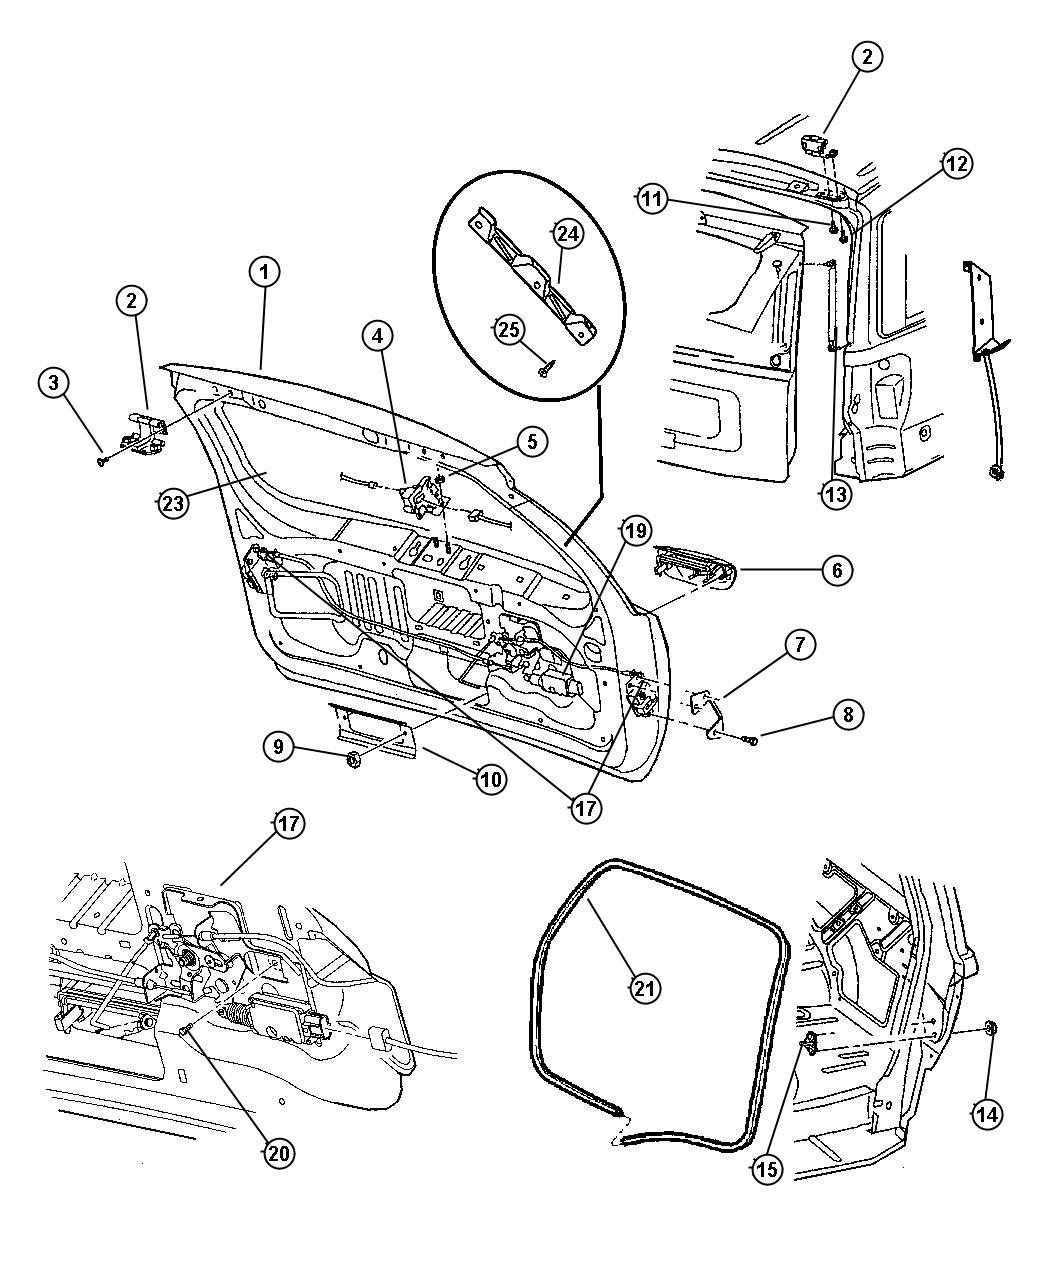 2008 dodge ram 2500 sel wiring diagram